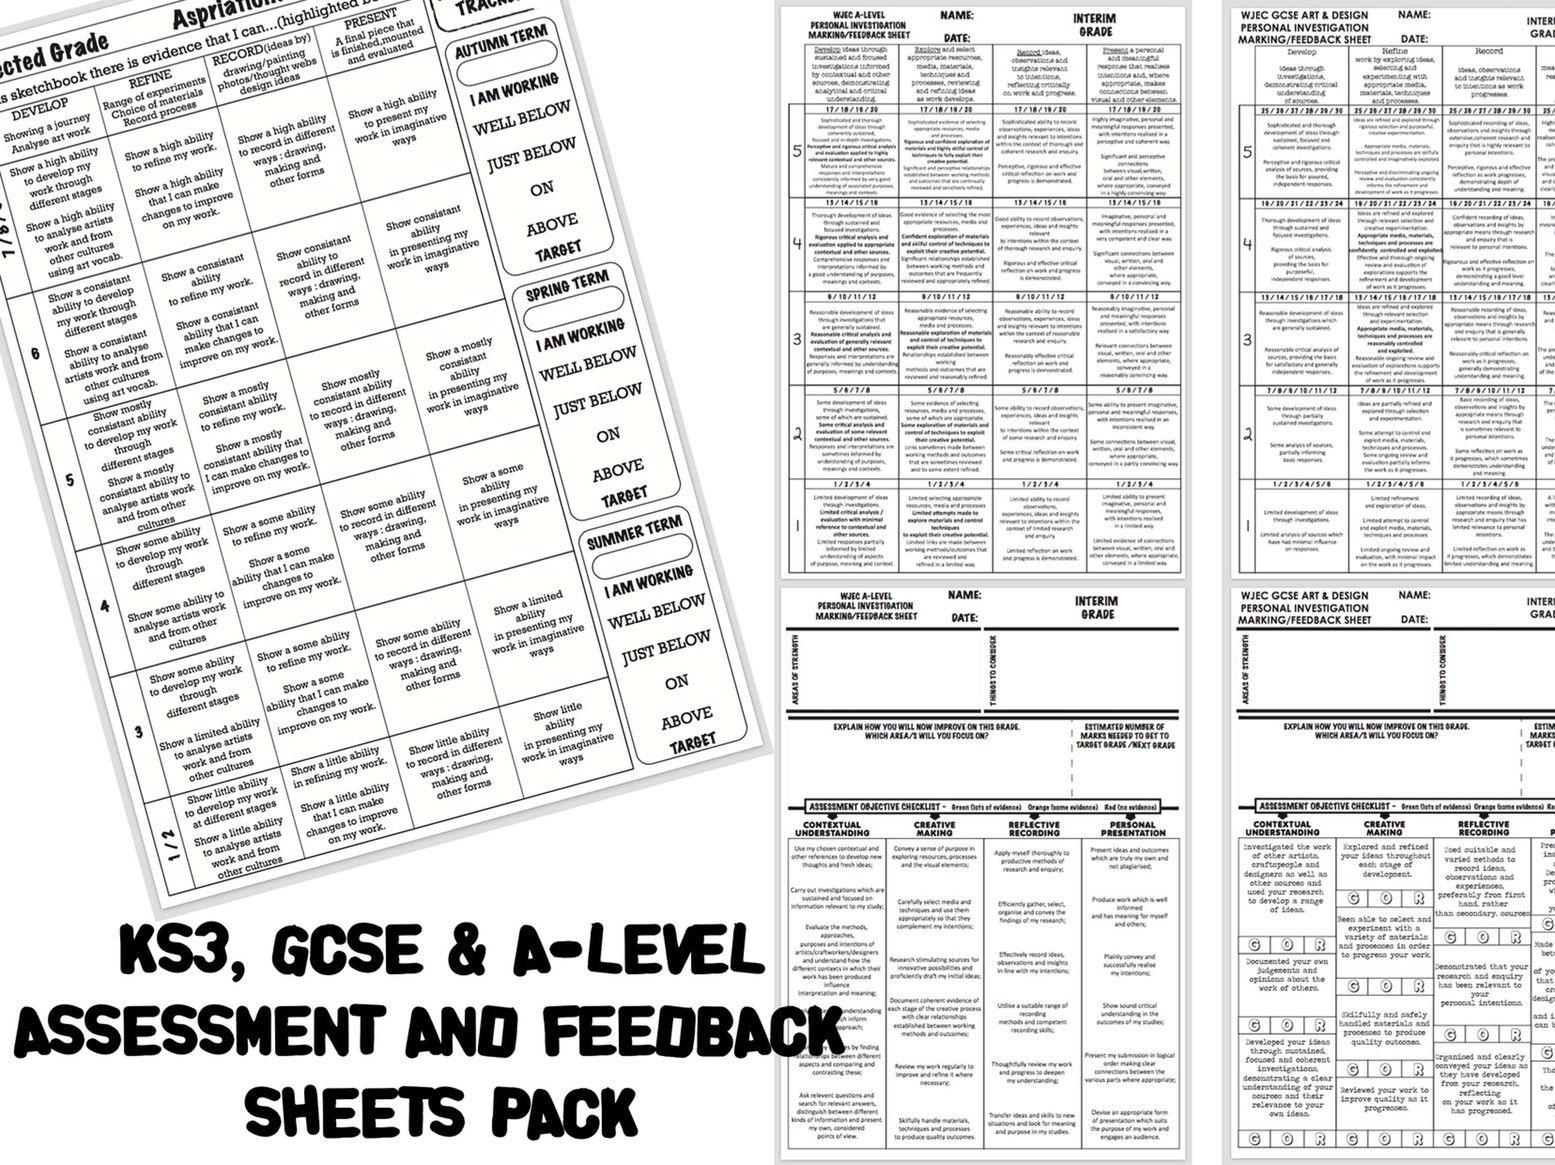 Complete KS3, GCSE & A-LEVEL ART ASSESSMENT/MARKING/FEEDBACK Pack